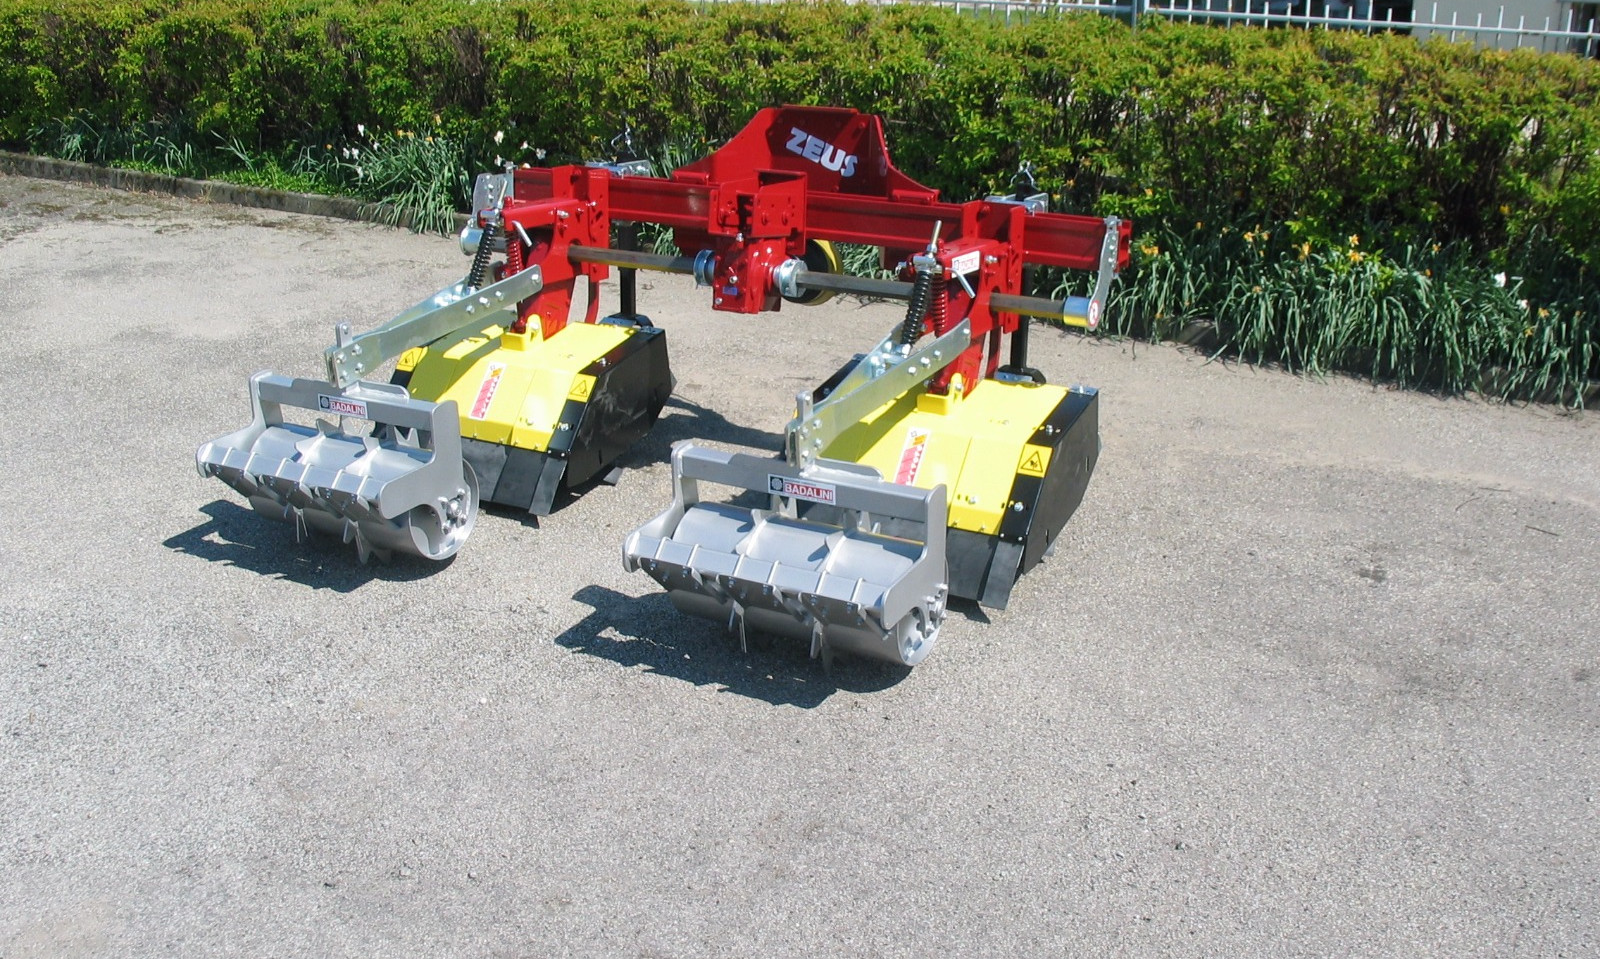 Multirototiller Weed Control Equipment of Sale